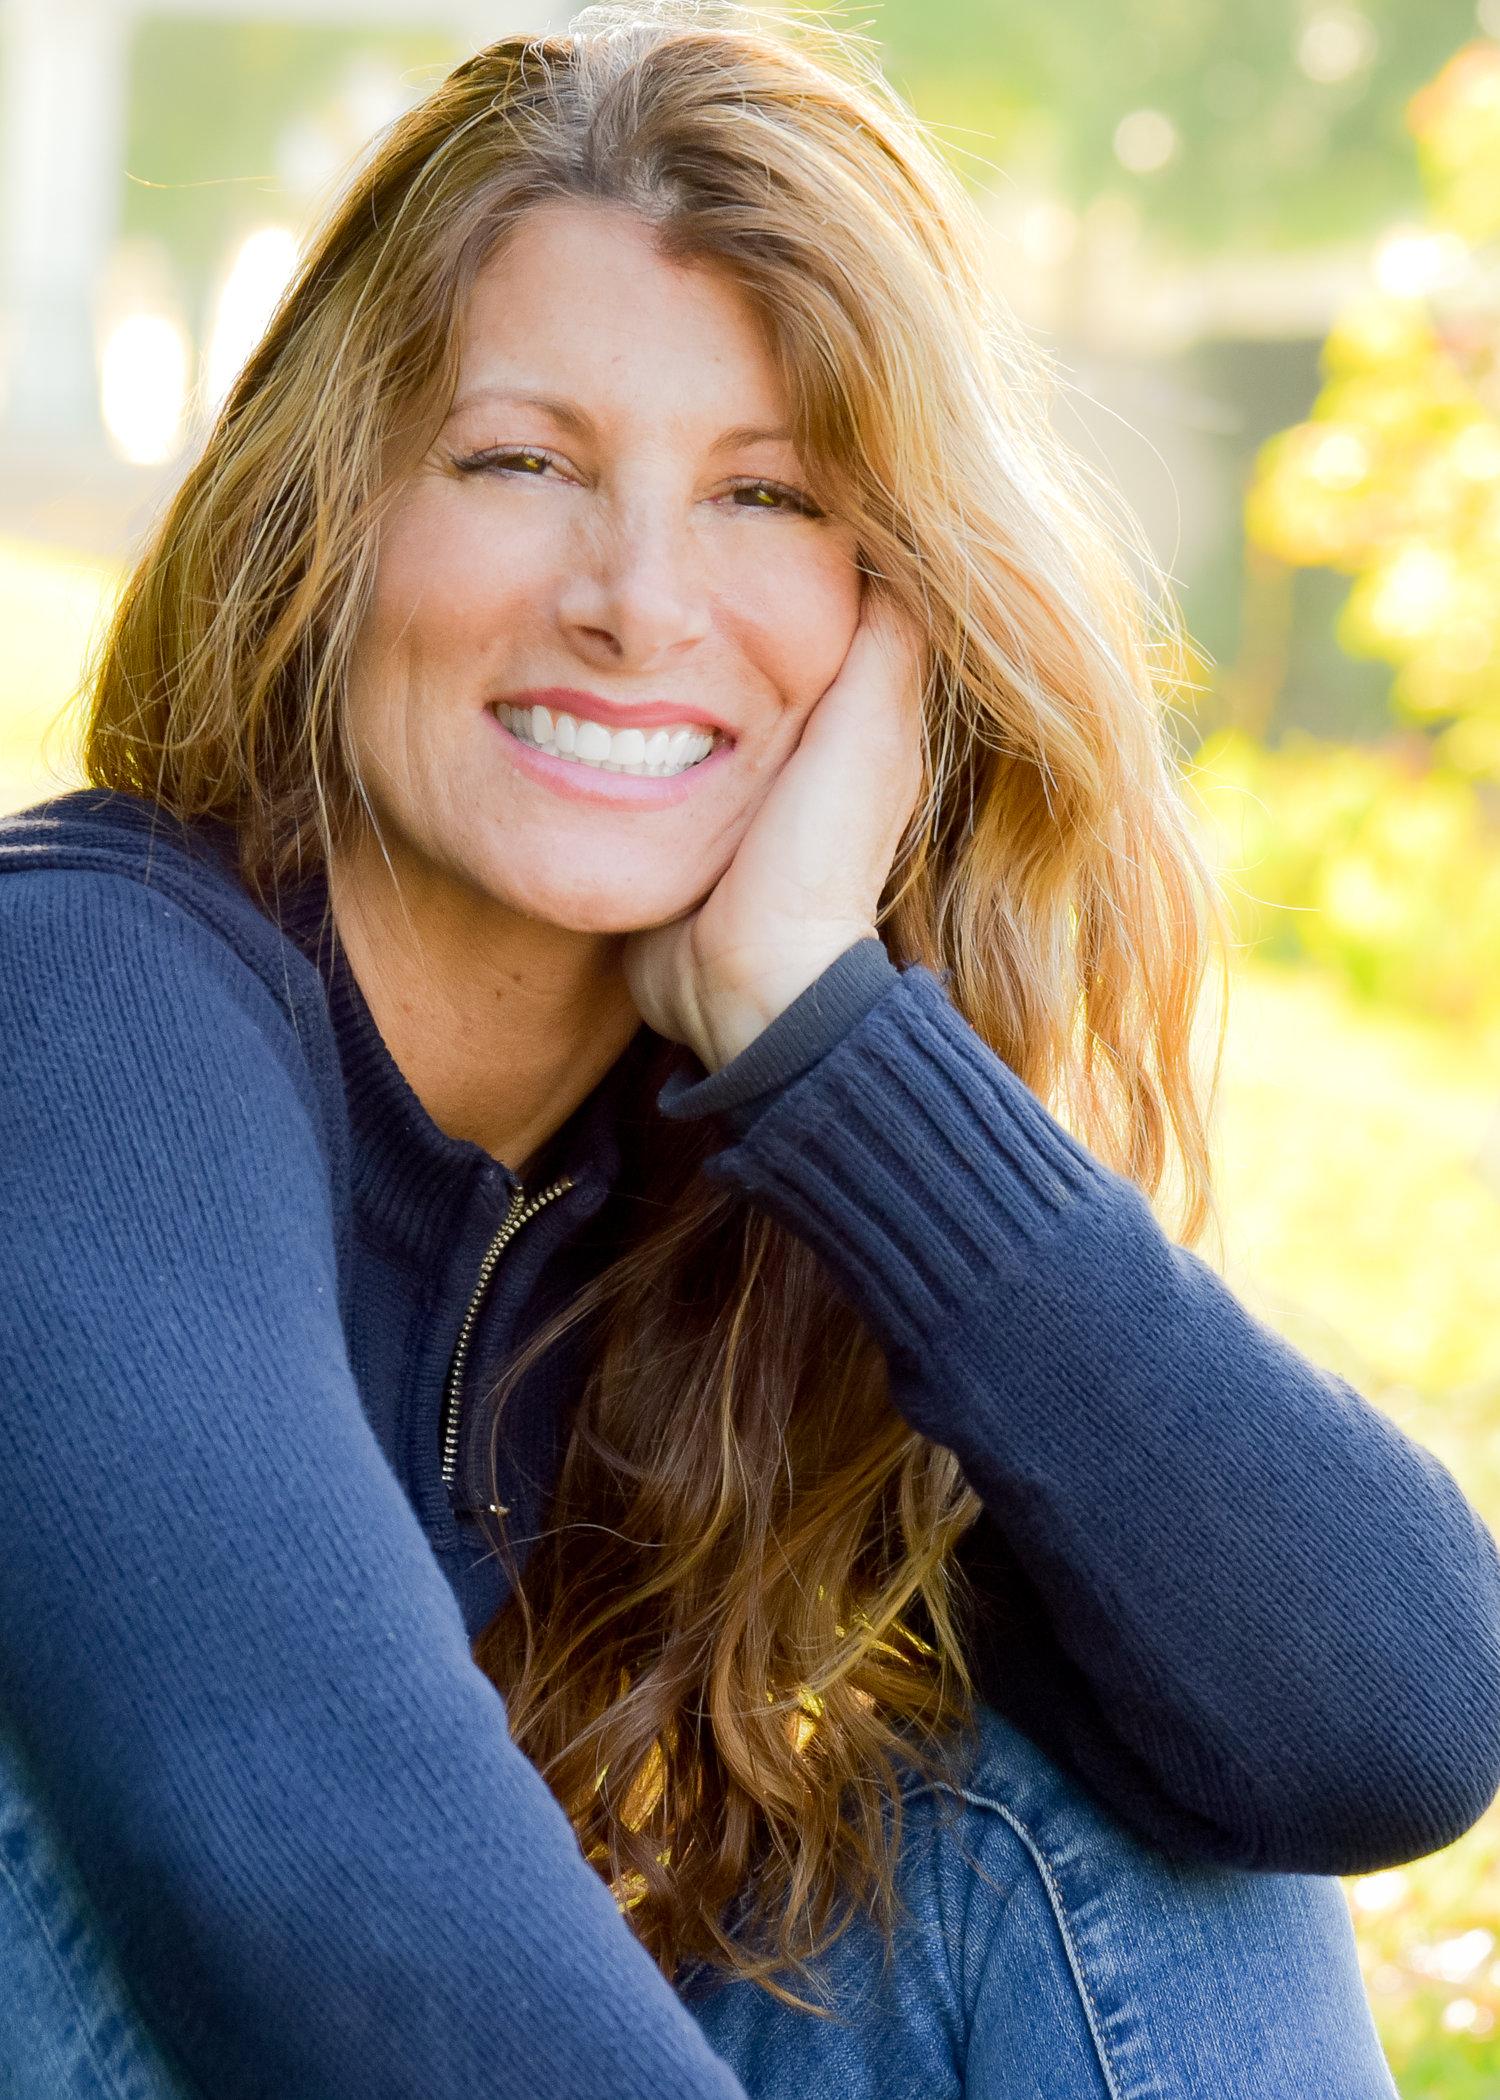 Cindy Bohn - Owner and Director